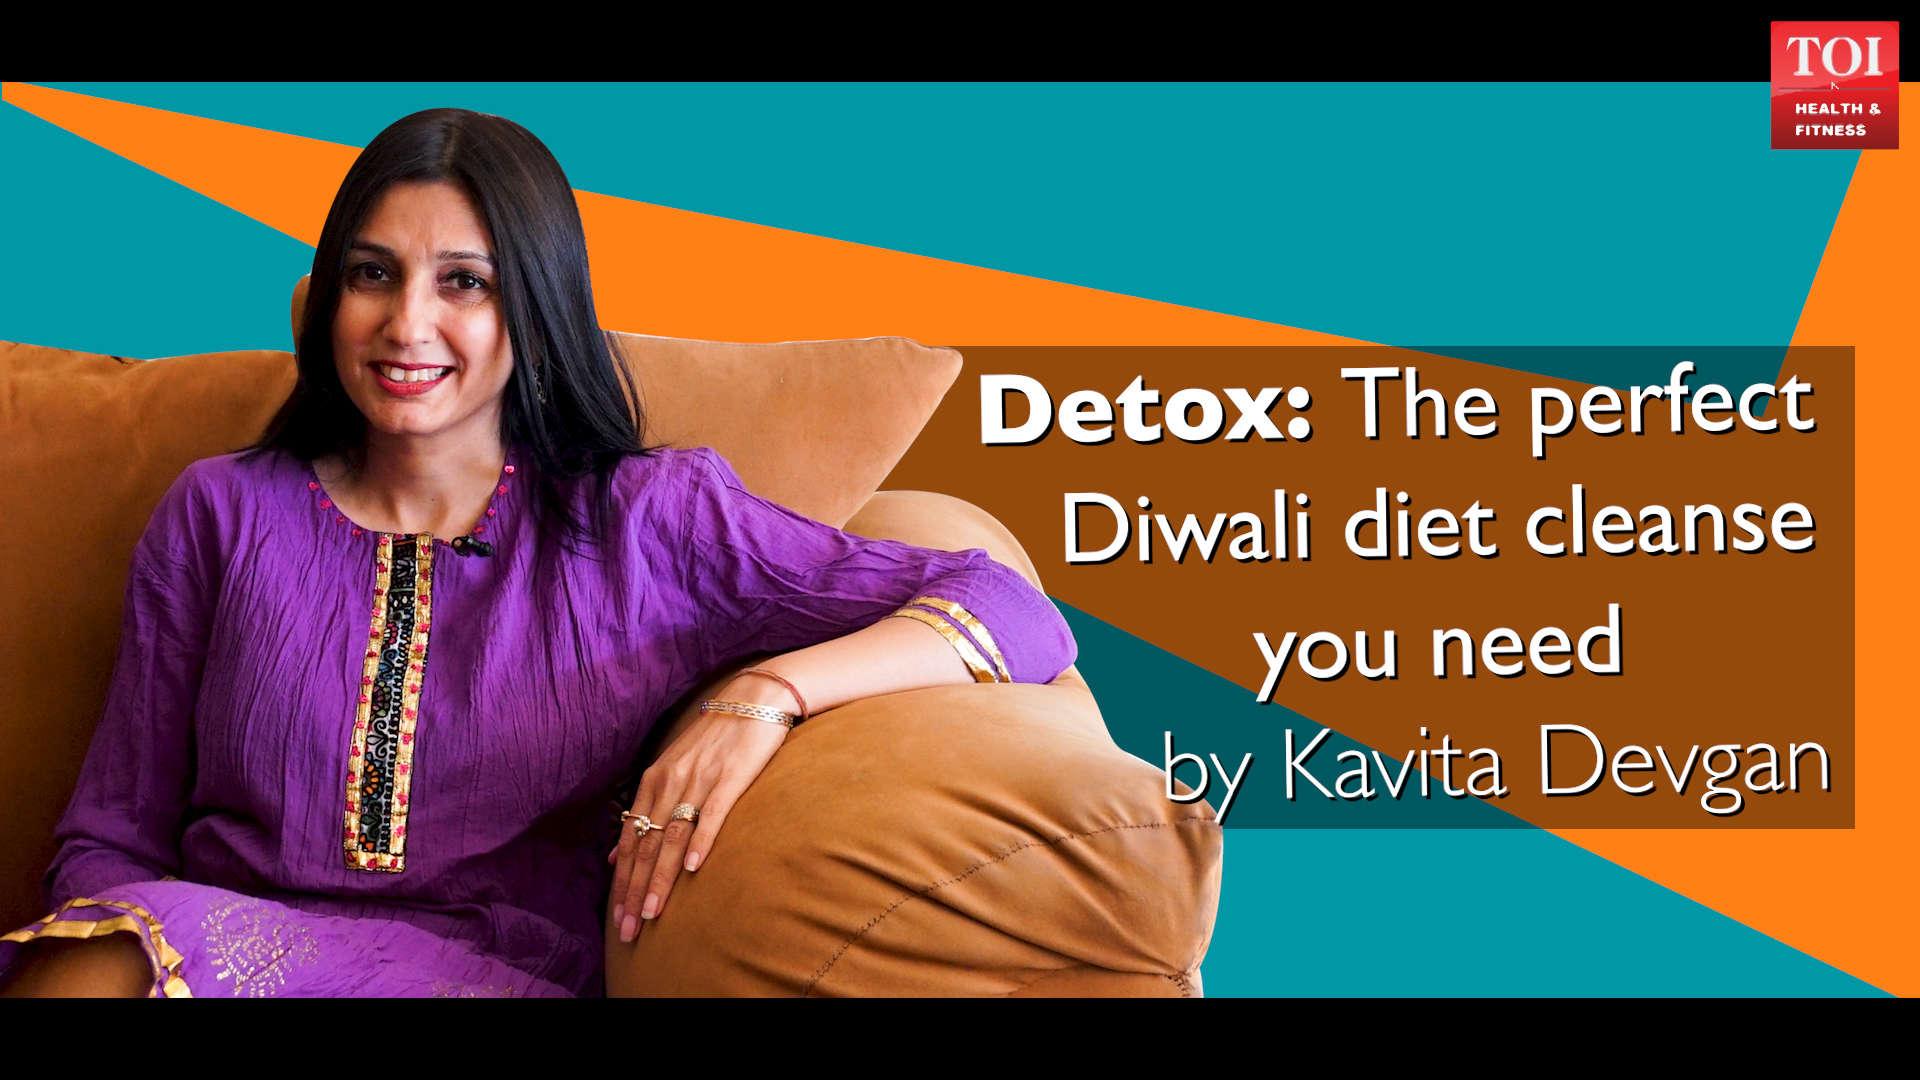 The perfect Diwali diet cleanse you need by Kavita Devgan